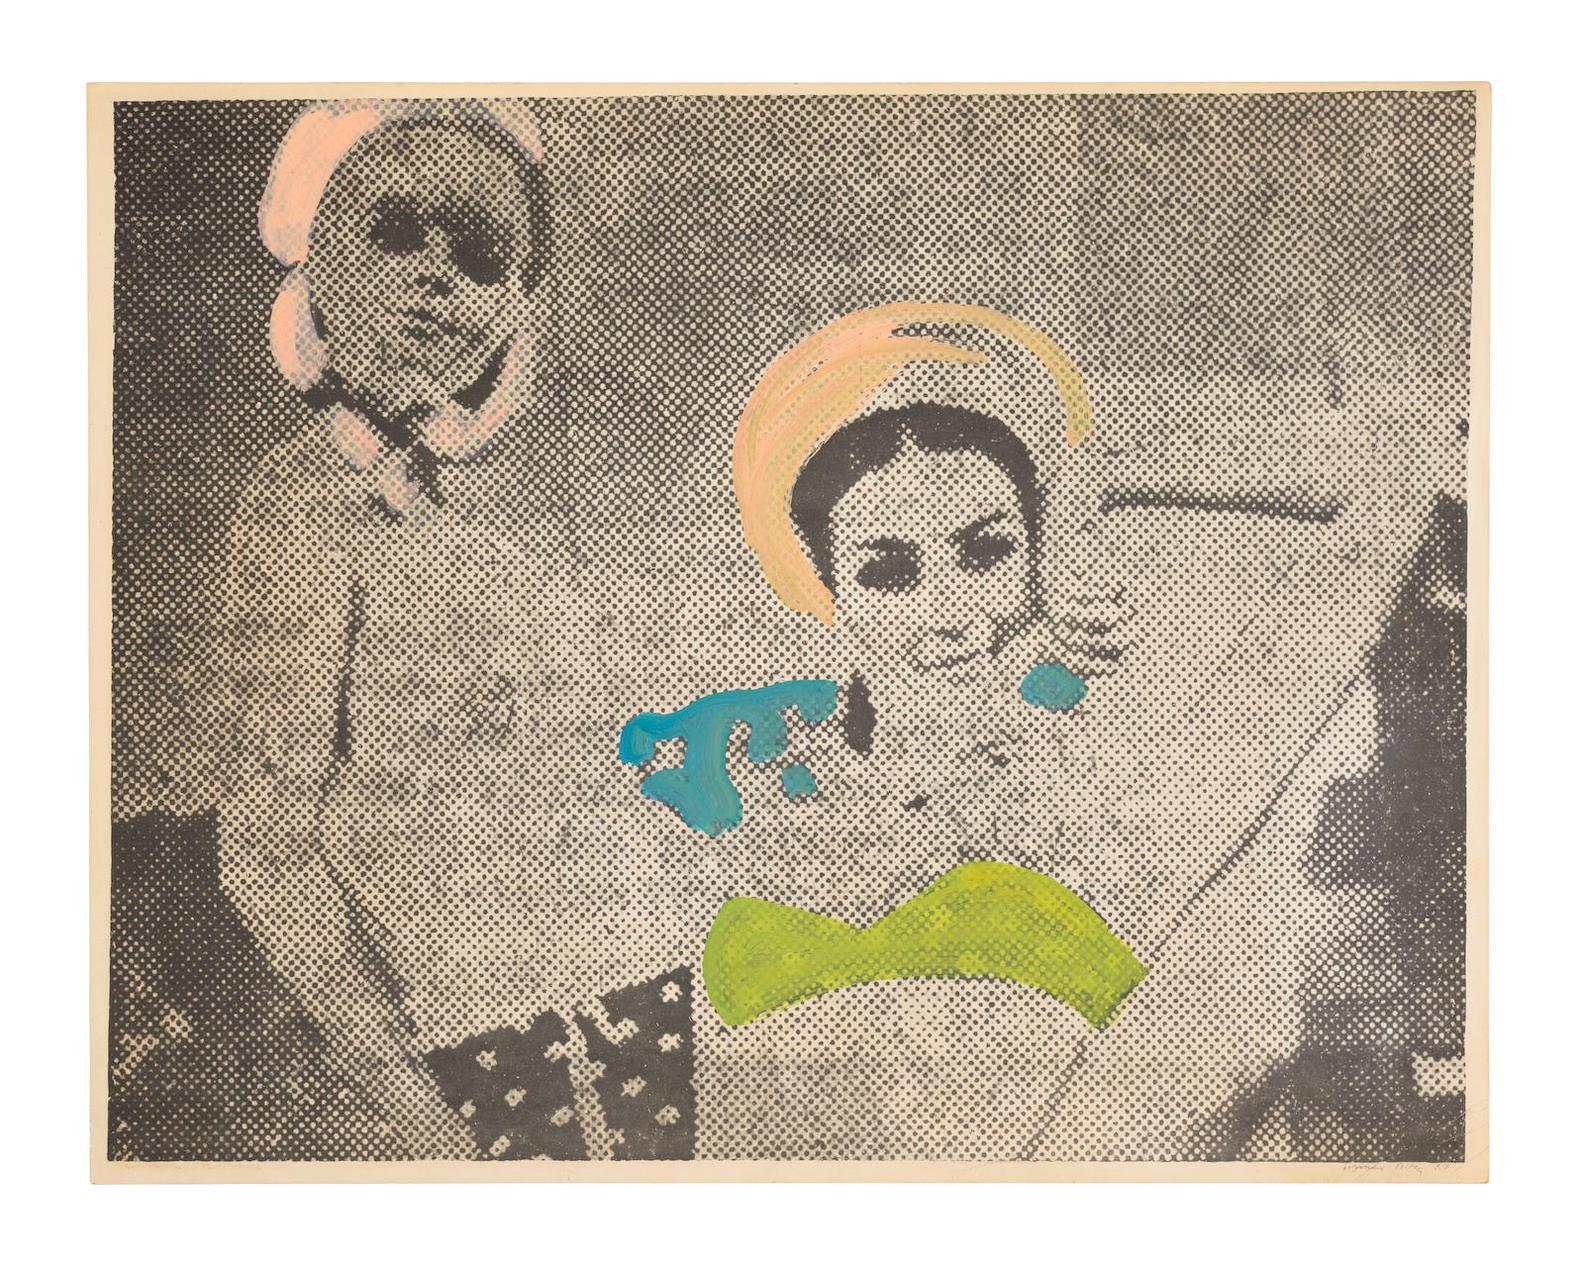 Sigmar Polke-Freundinnen II-1967